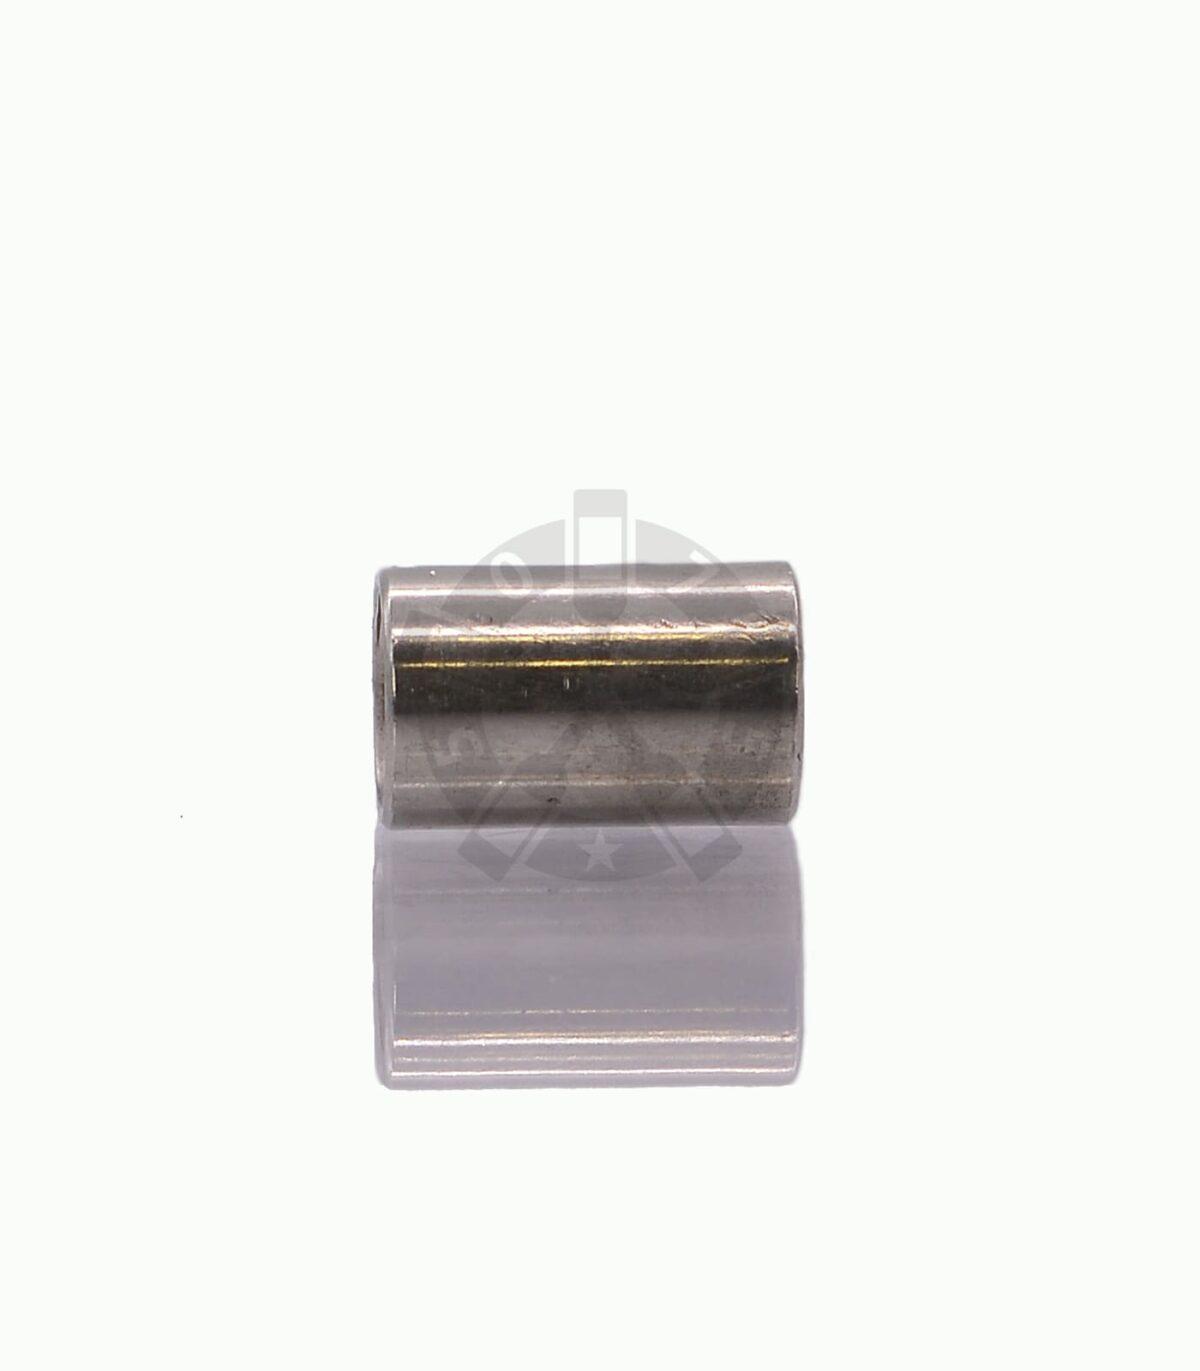 Муфта под кран, резьба 1/2, длина 30 мм (мама)